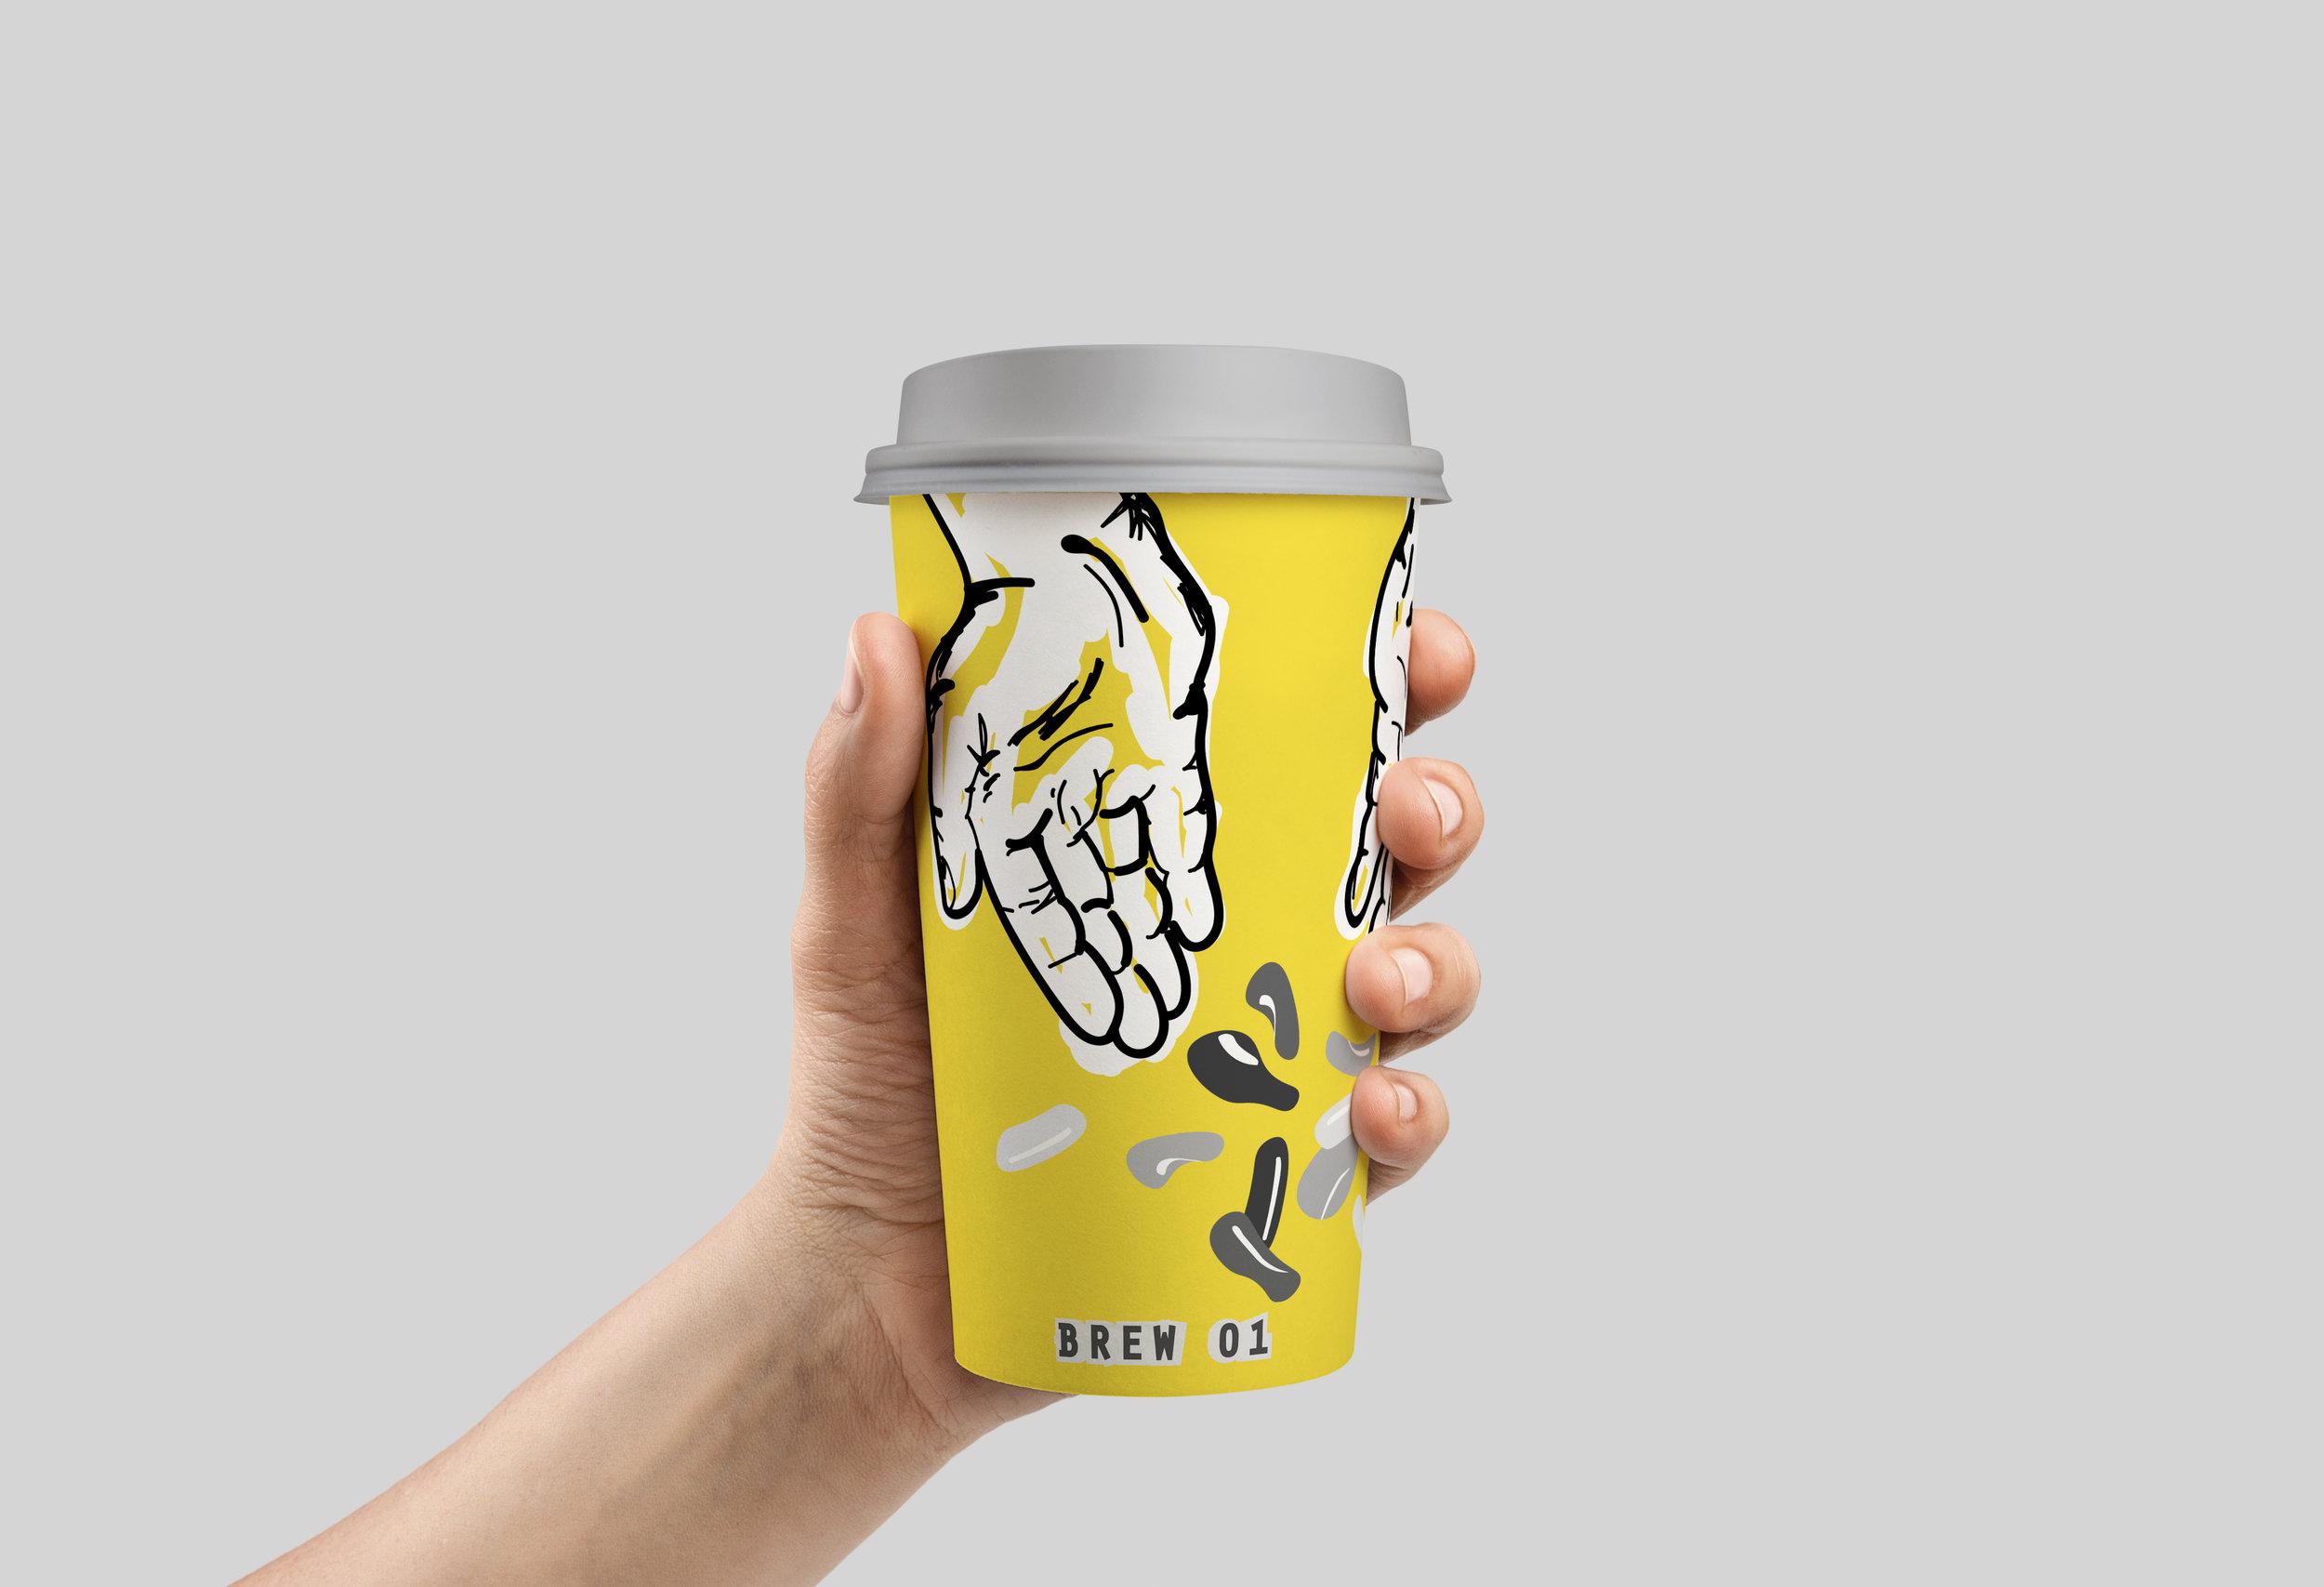 Medium cup_hands down.jpg